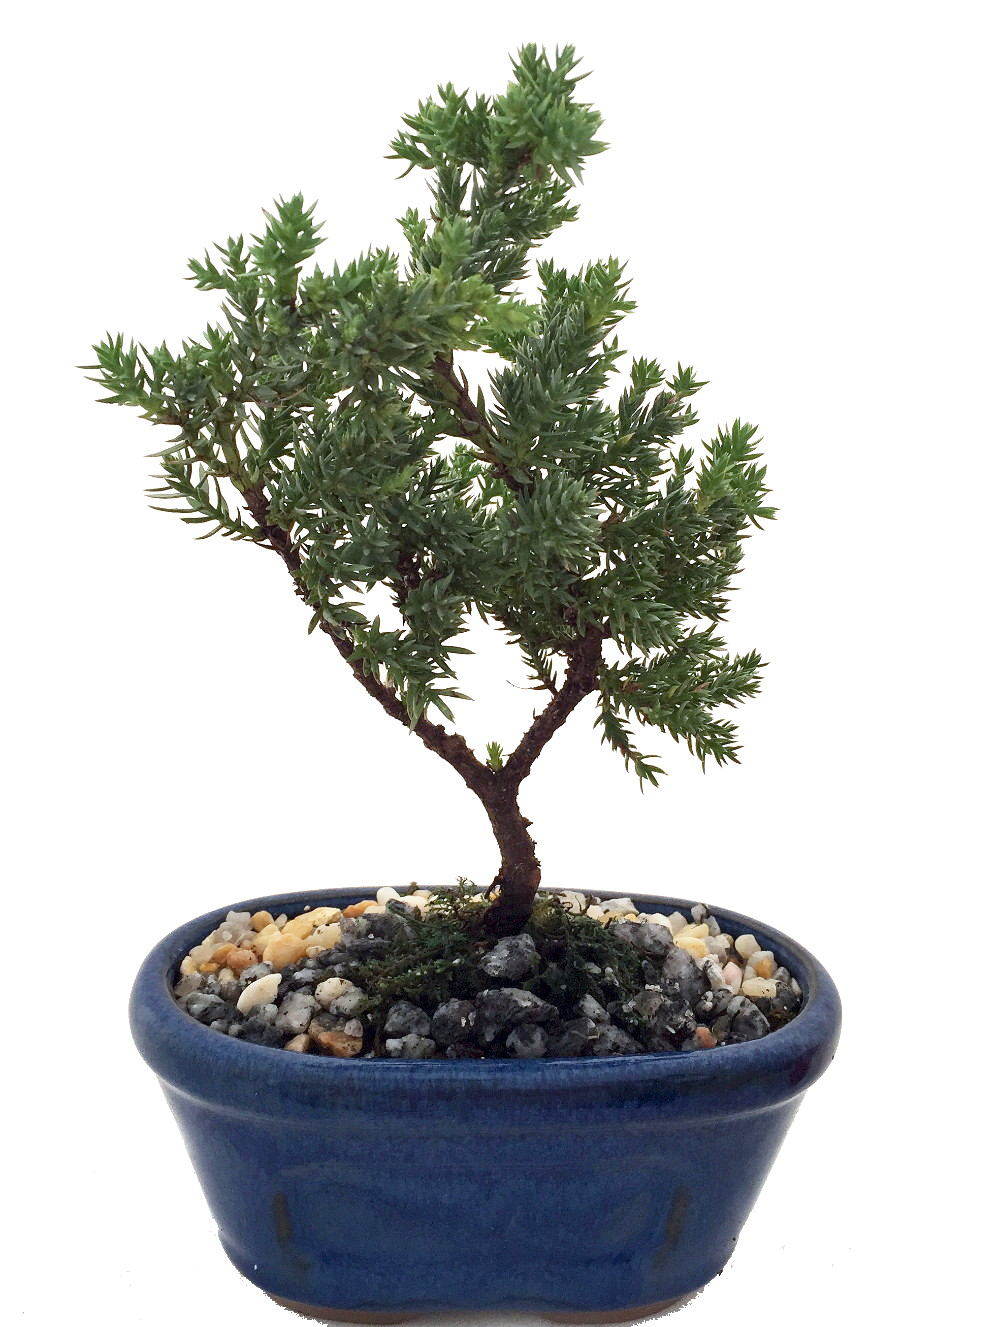 Miniature Japanese Juniper Bonsai Tree Ceramic Bonsai Pot Hirt S Gardens